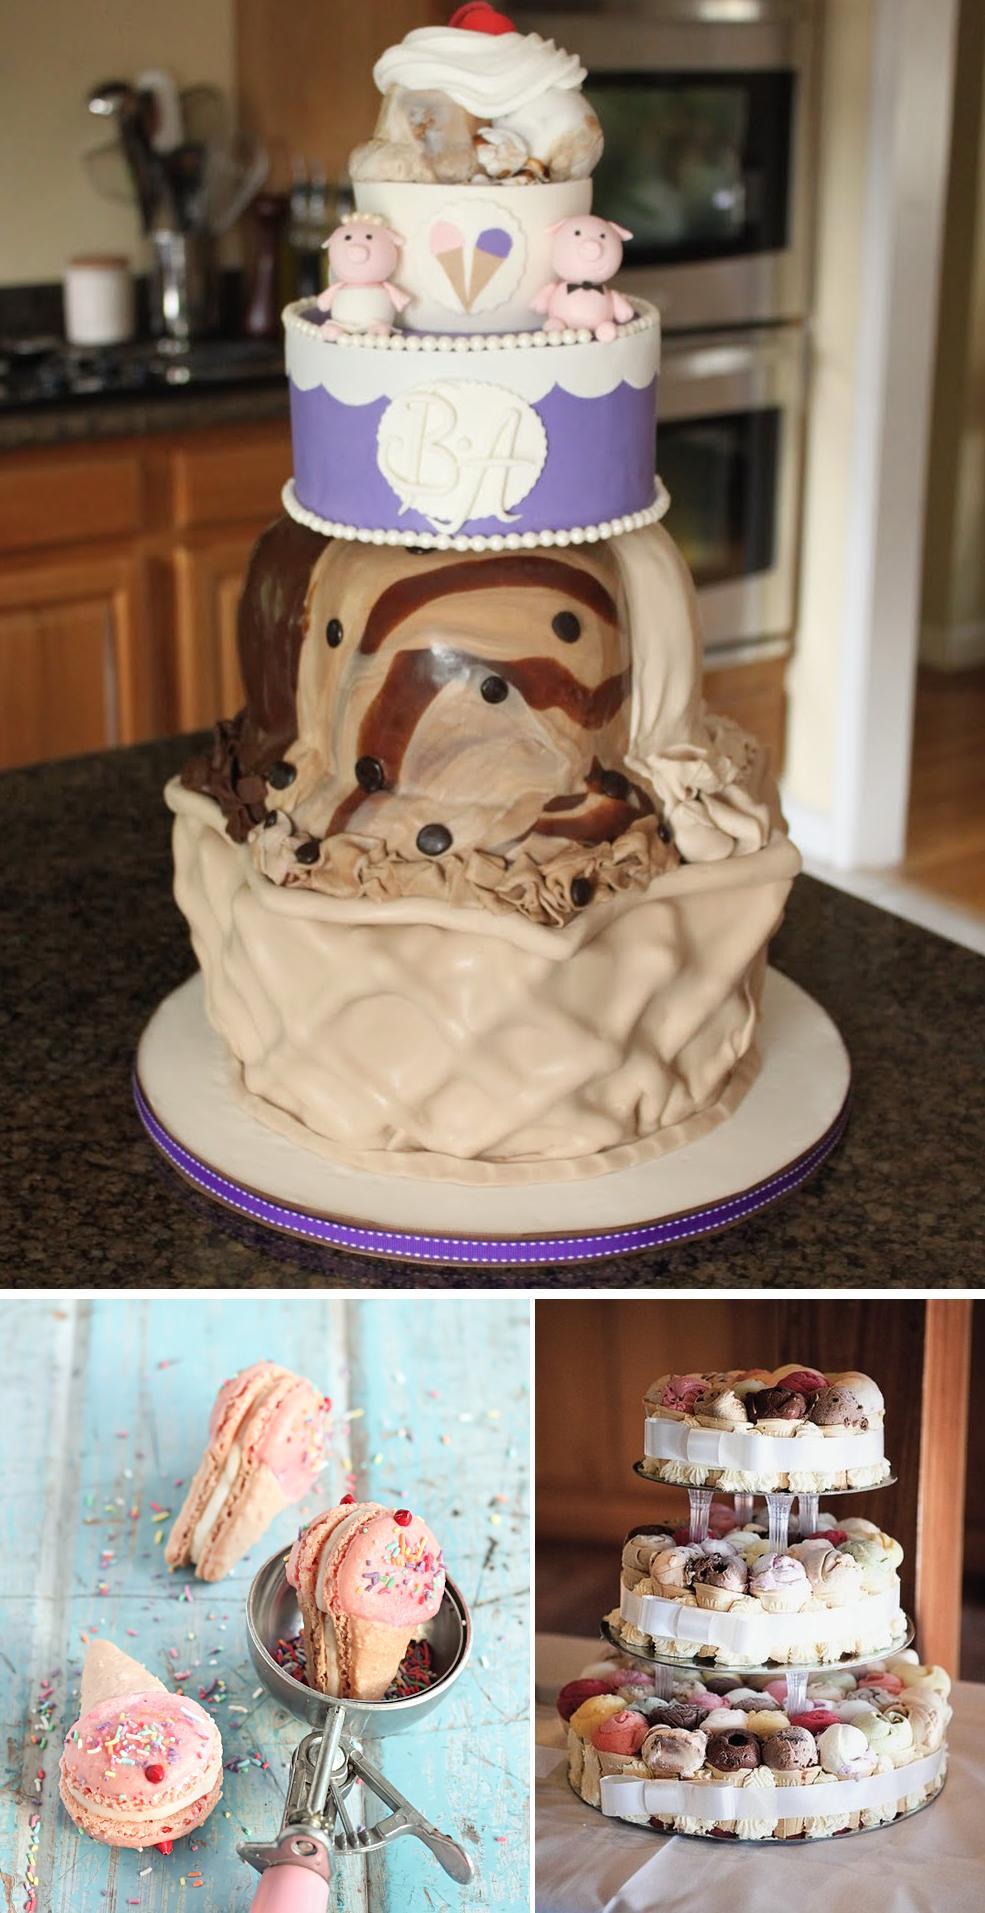 wedding cake alternatives ice cream cakes. Black Bedroom Furniture Sets. Home Design Ideas